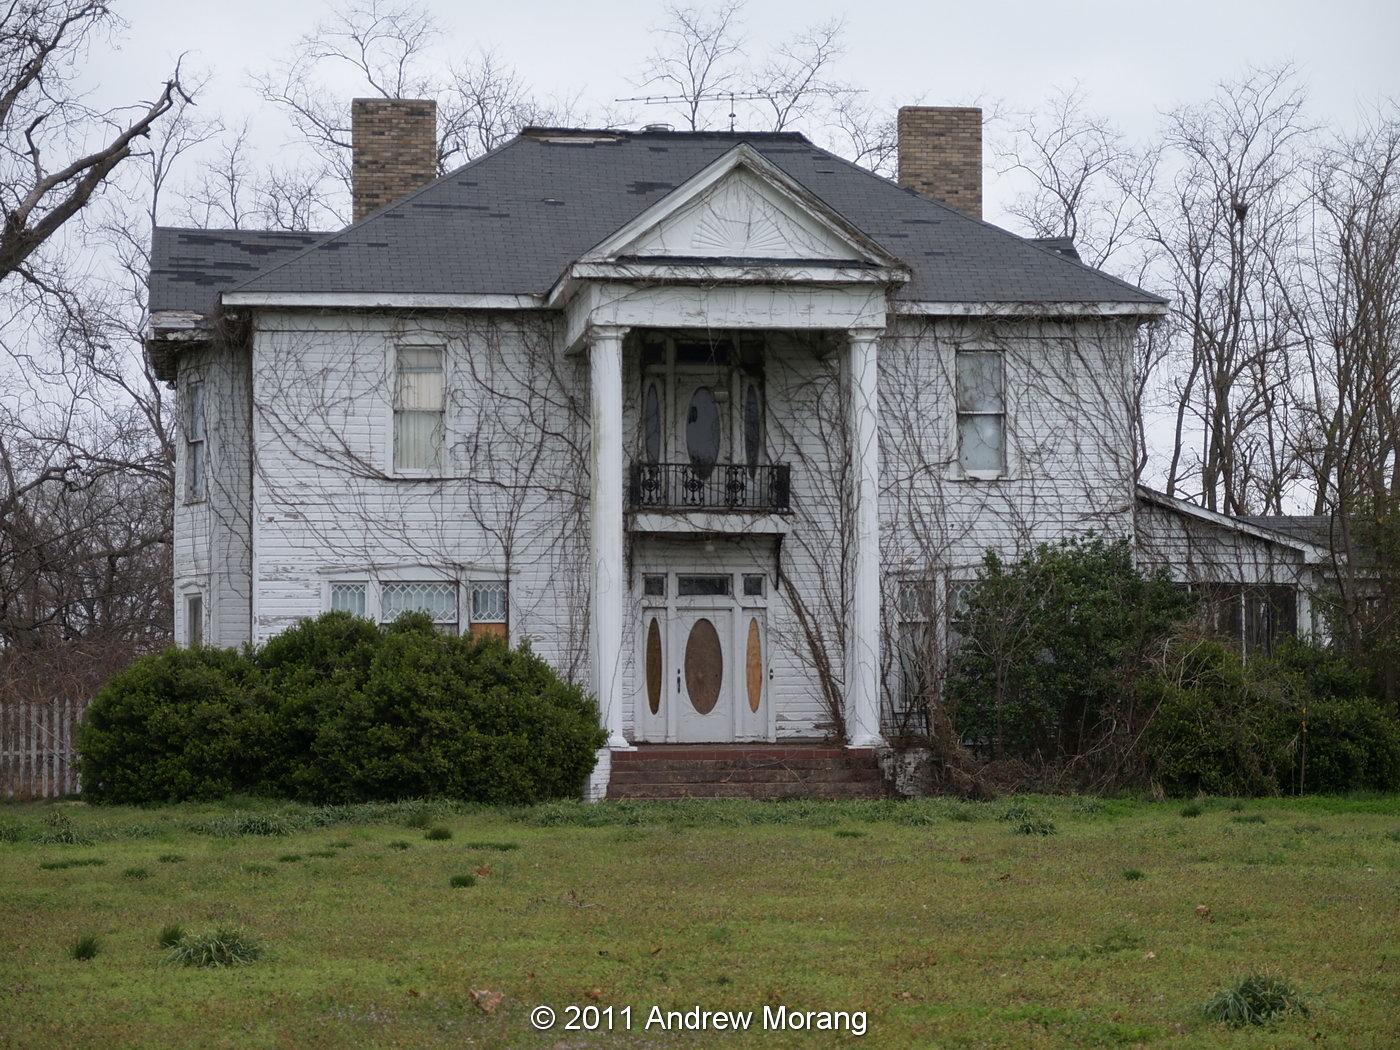 Mississippi washington county chatham - Urban Decay